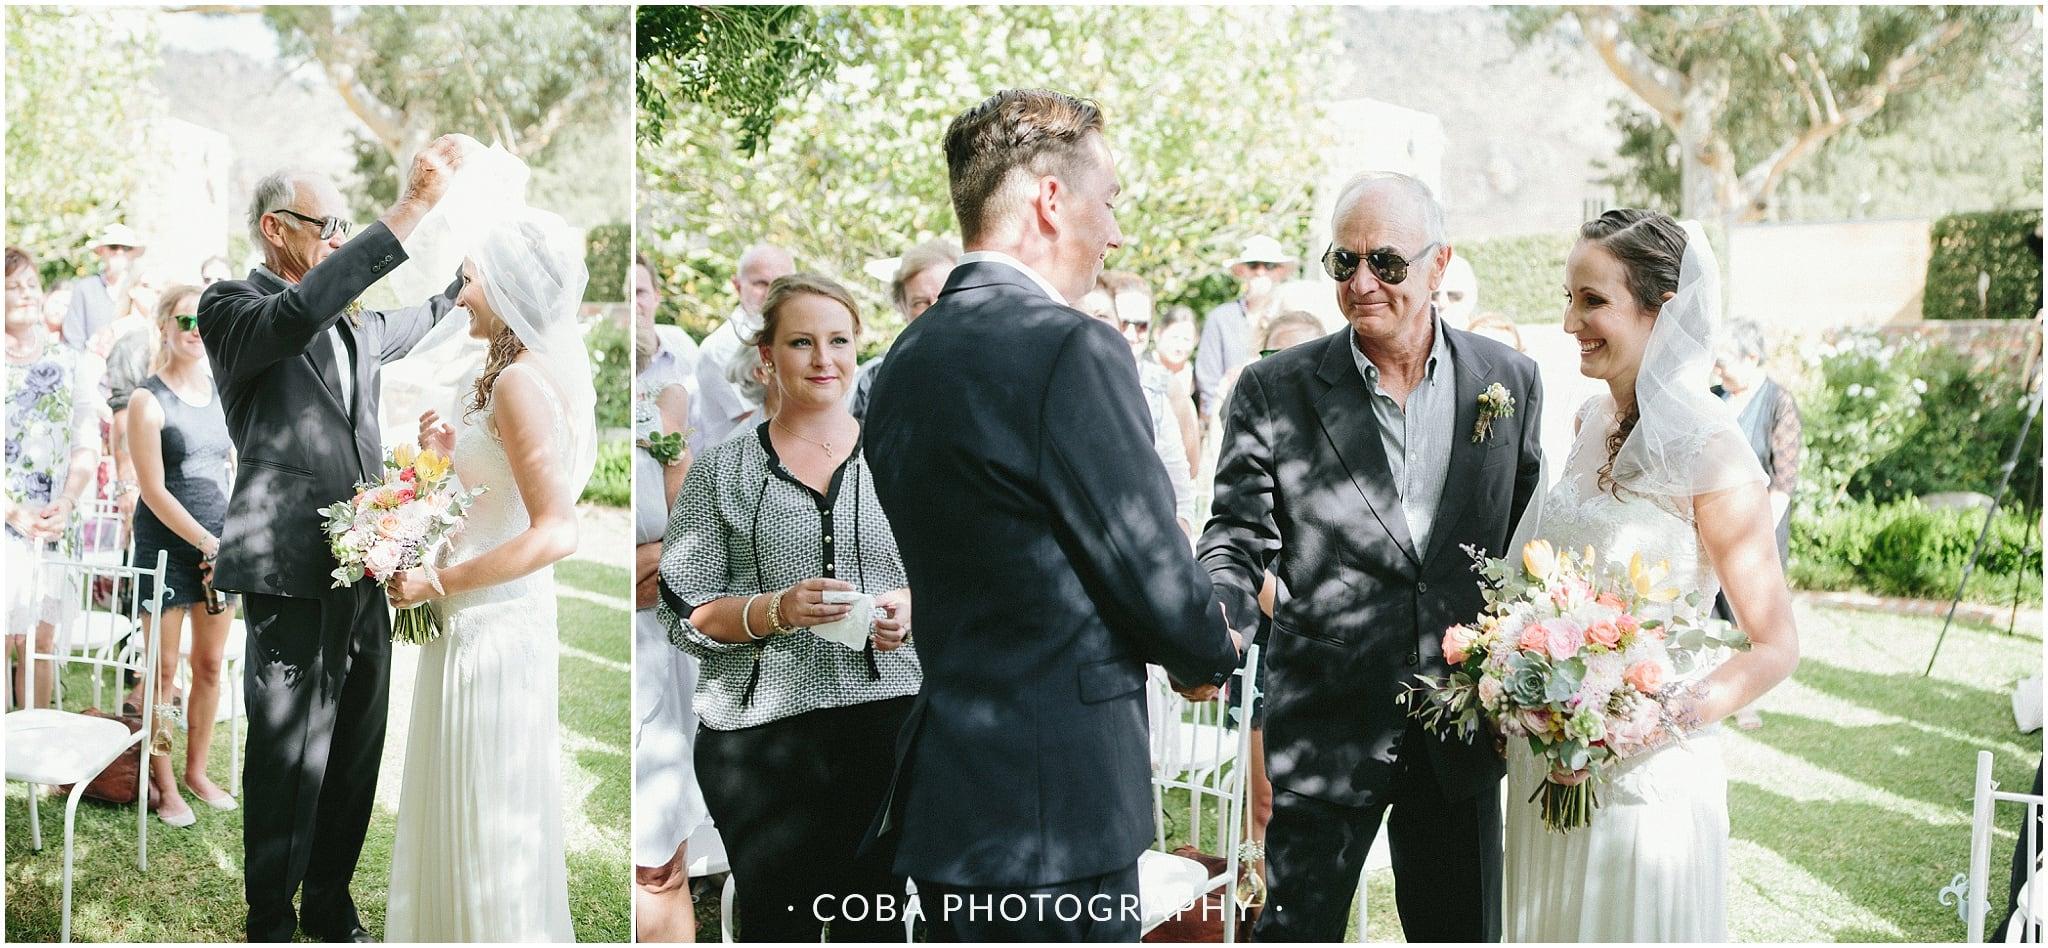 John&Pad - Olive Rock - Coba Photography (74)